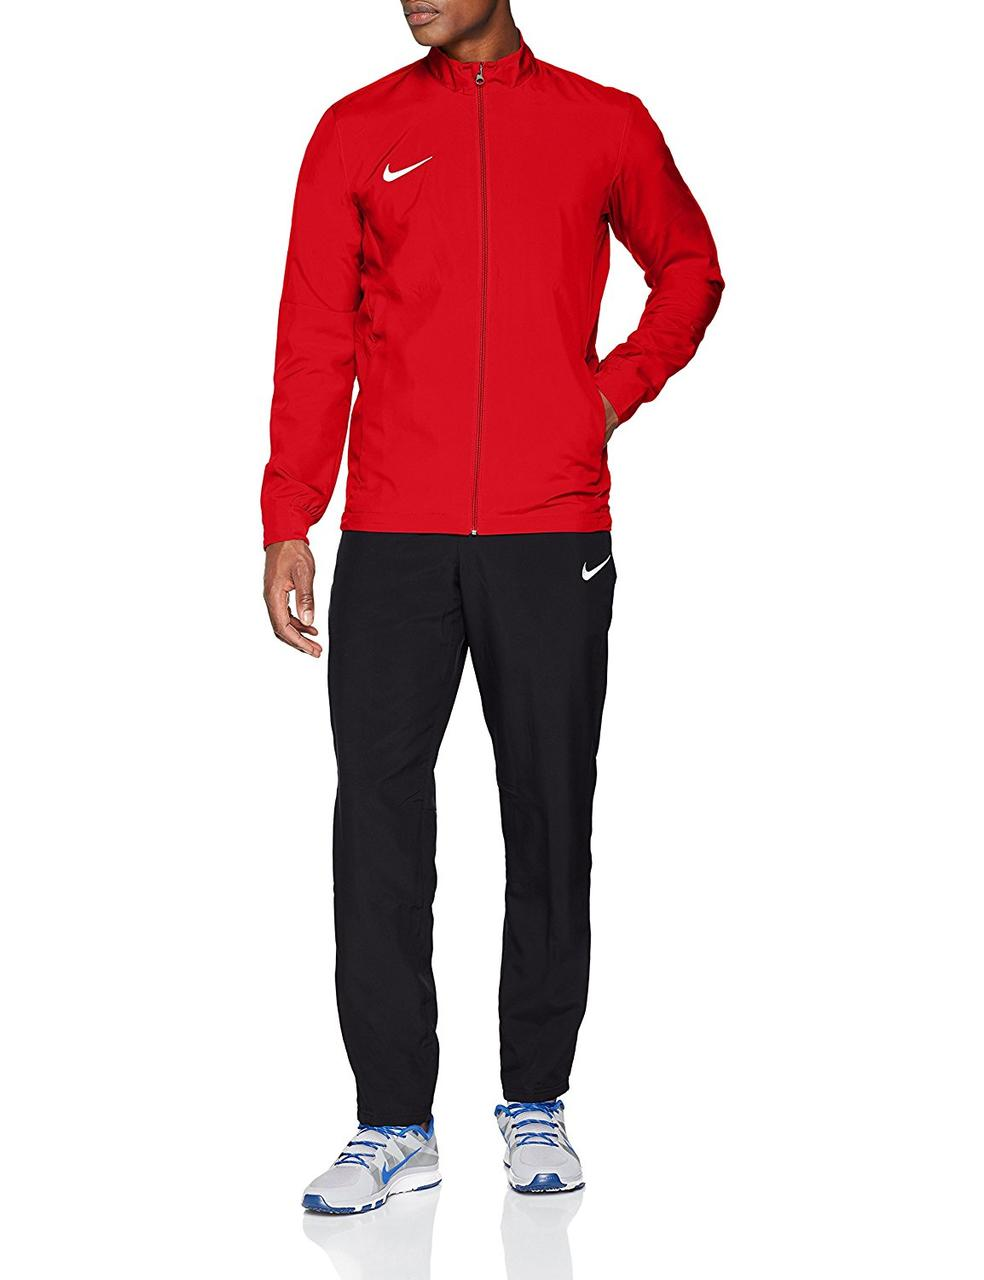 2b3d884b Спортивный костюм Nike Academy 16 WVN 808758-657 -